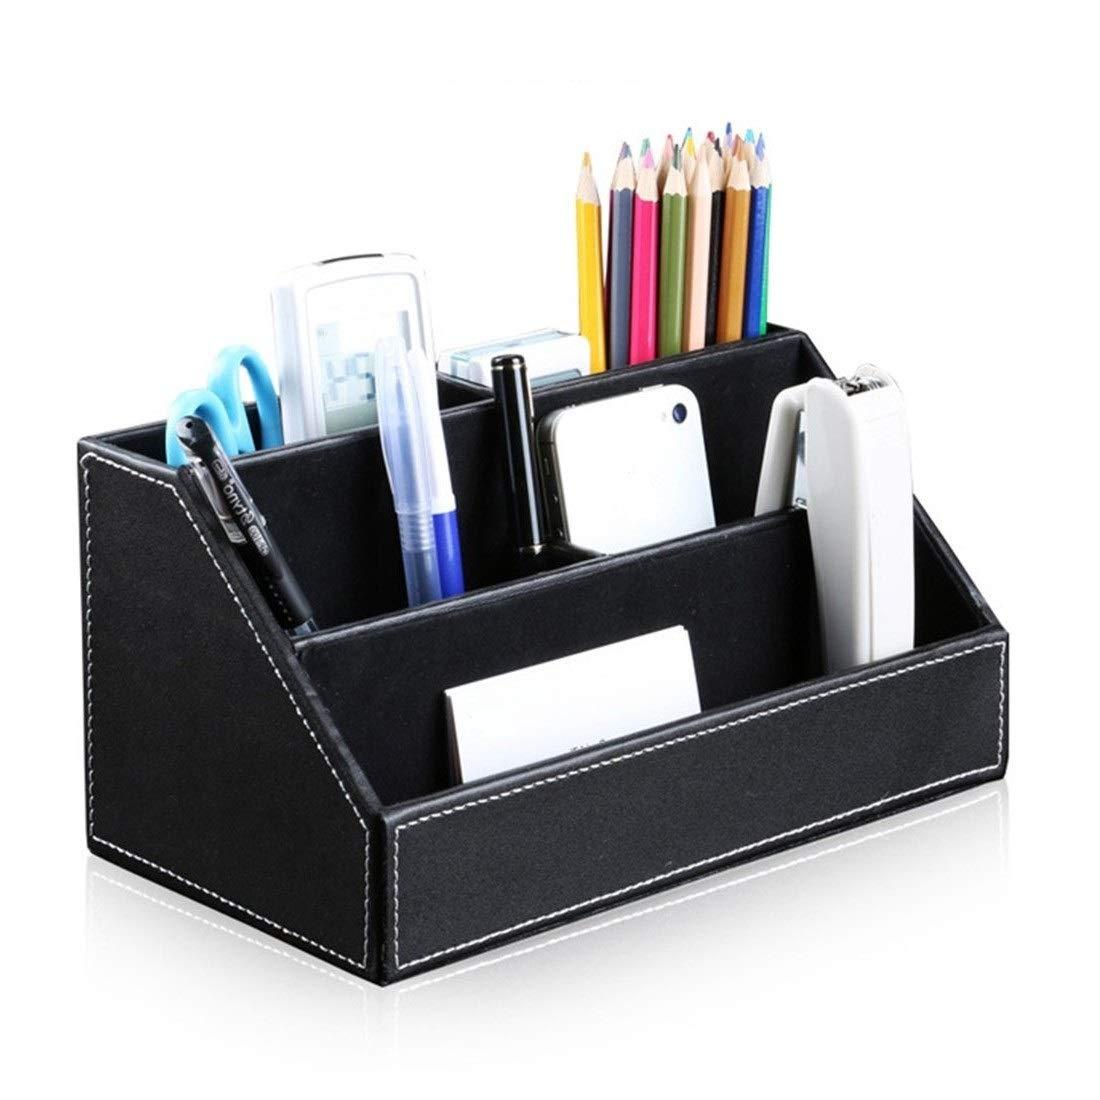 Bargain Crusader Black PU Leather Remote Controller Holder TV Guide CD DVD Controller Organizer Desk Caddy Stationery Organizer Caddy Stationery Holder (L:9.45 x W:5.3 x H:4.3/1.6 inches, Black)